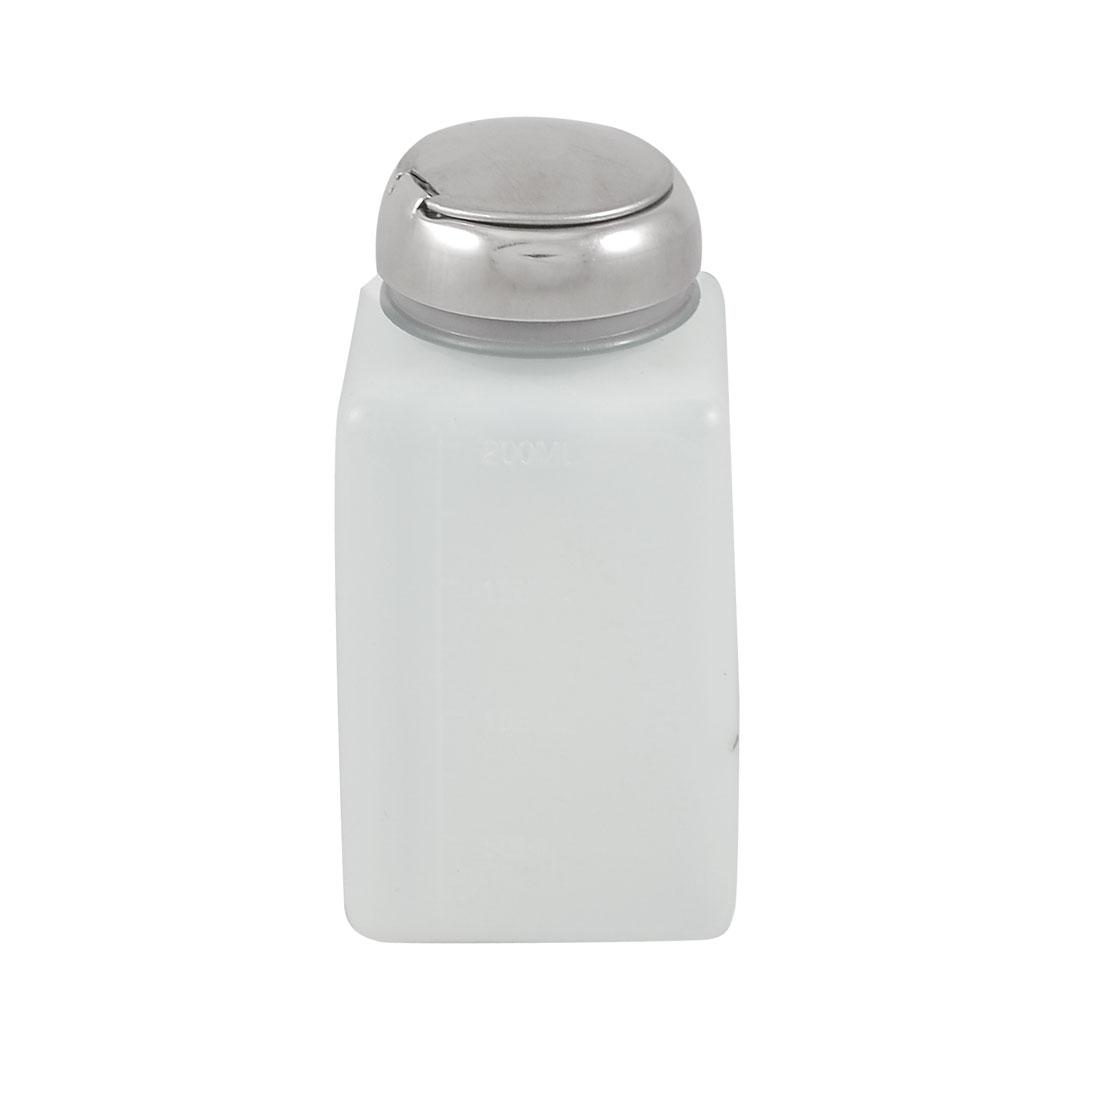 Silver Tone Pump Cap White Plastic Graduated Alcohol Bottle 200ml